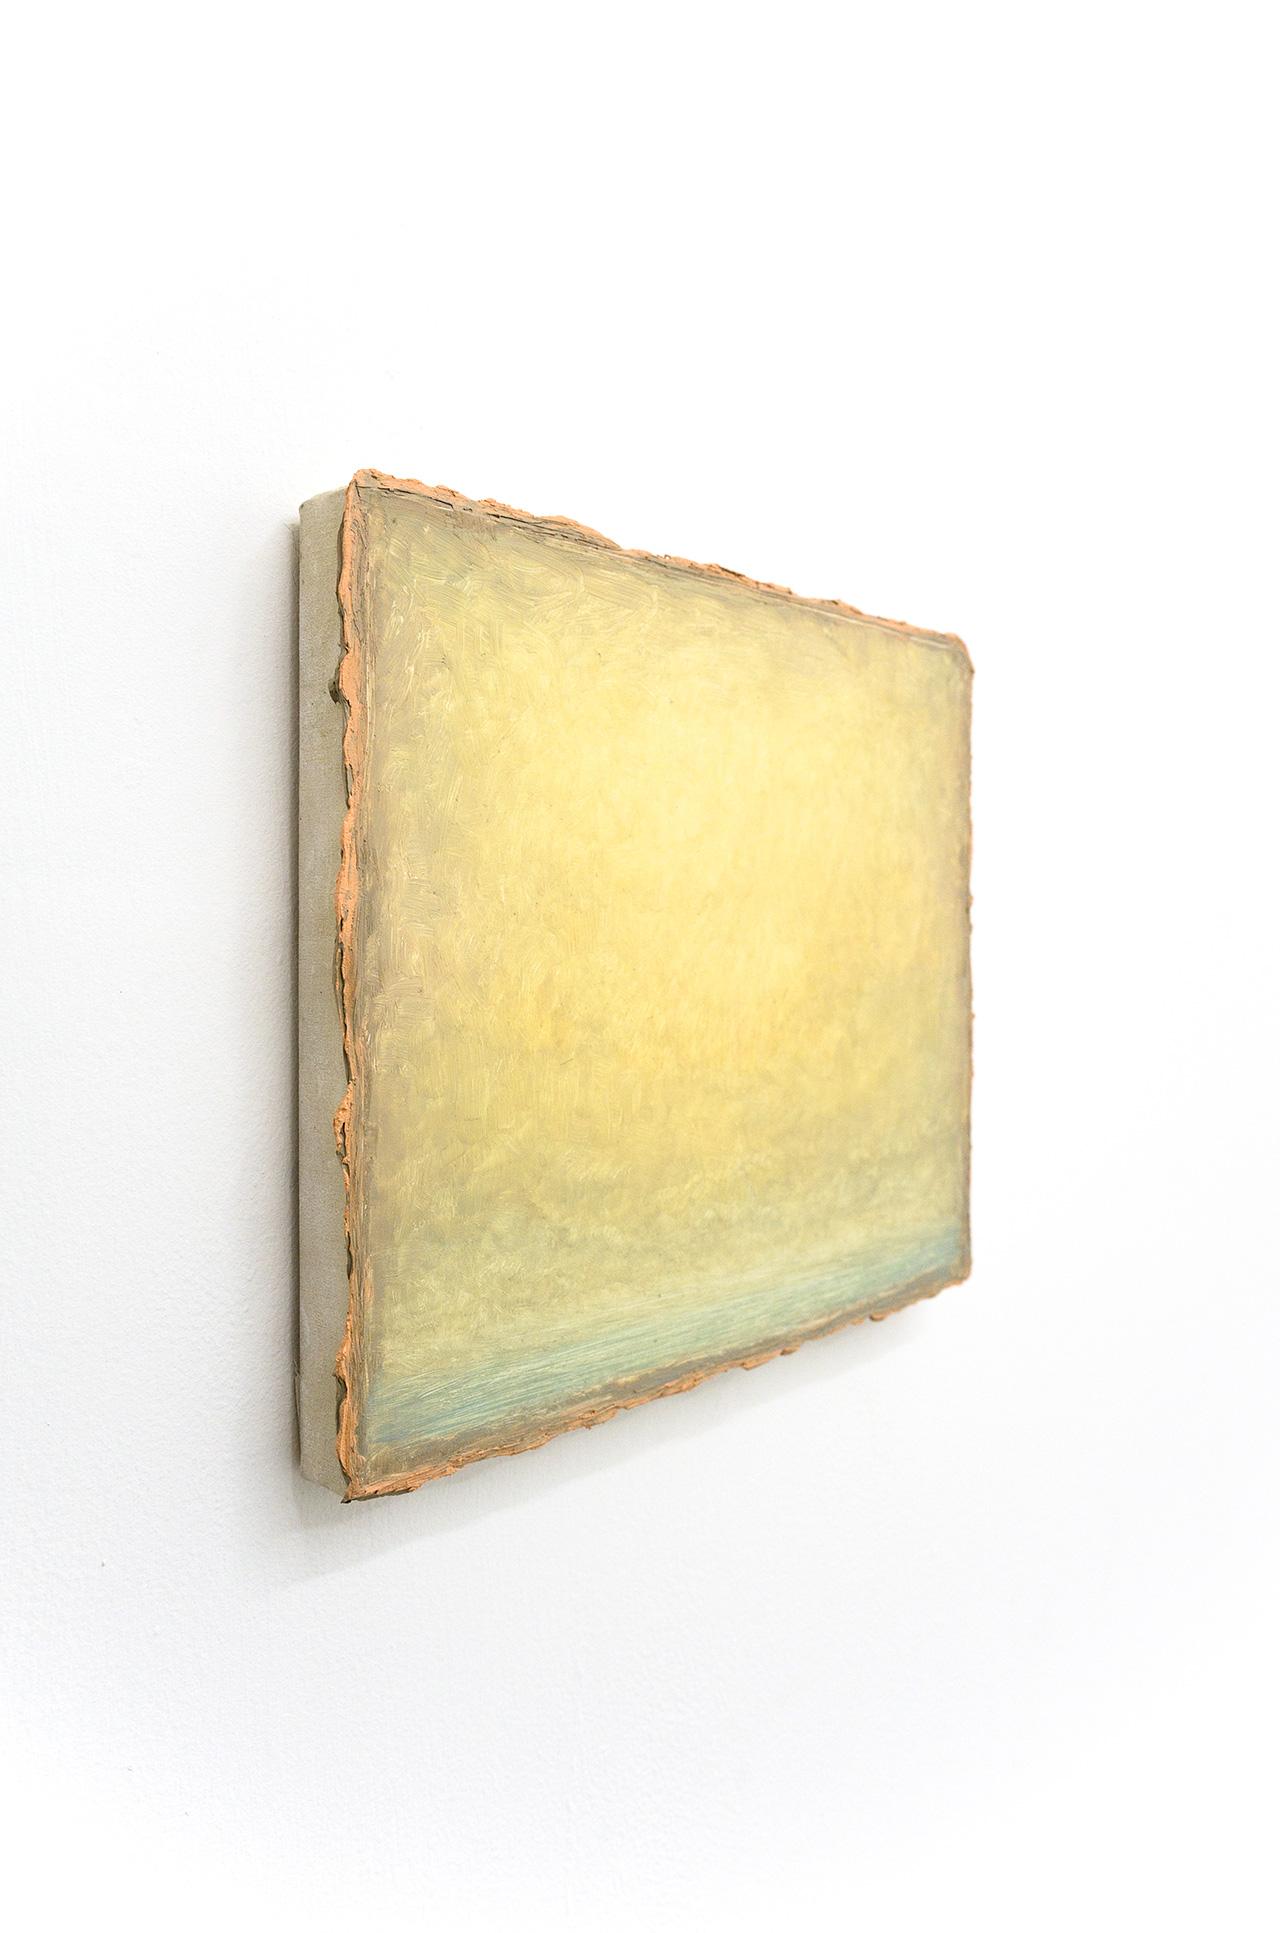 "Lucas Arruda, ""Untitled (Deserto - Modelo)"" (2015), oil on canvas, 25 x 31 cm"